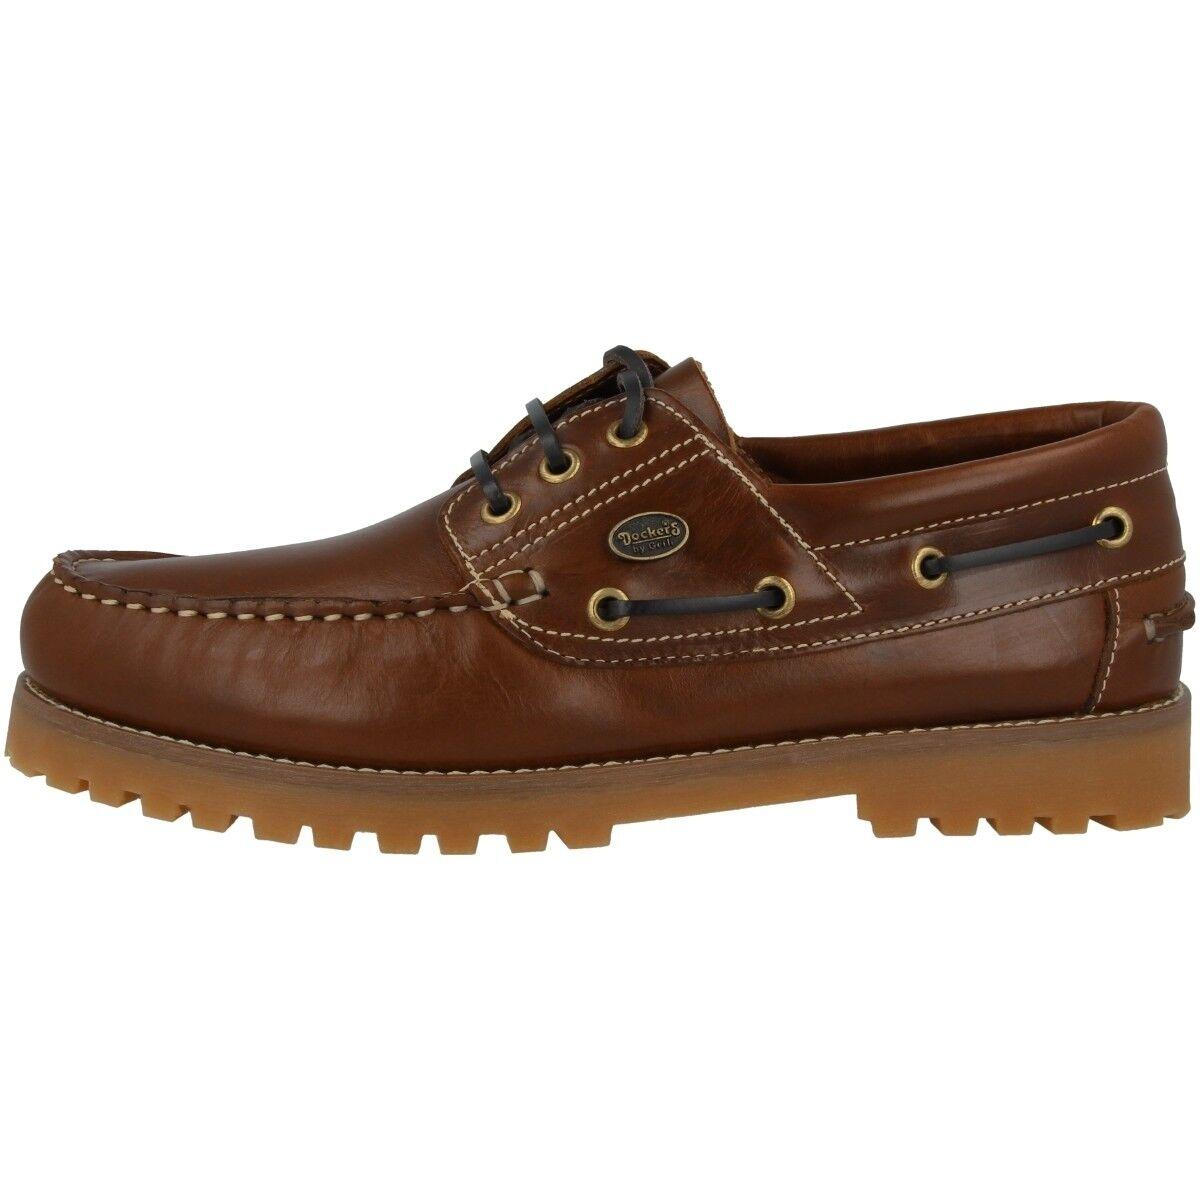 Dockers by Gerli 24DC001 Schuhe Halbschuhe Halbschuhe Schuhe Stiefelschuhe Sneaker 24DC001-180410 16ff1a